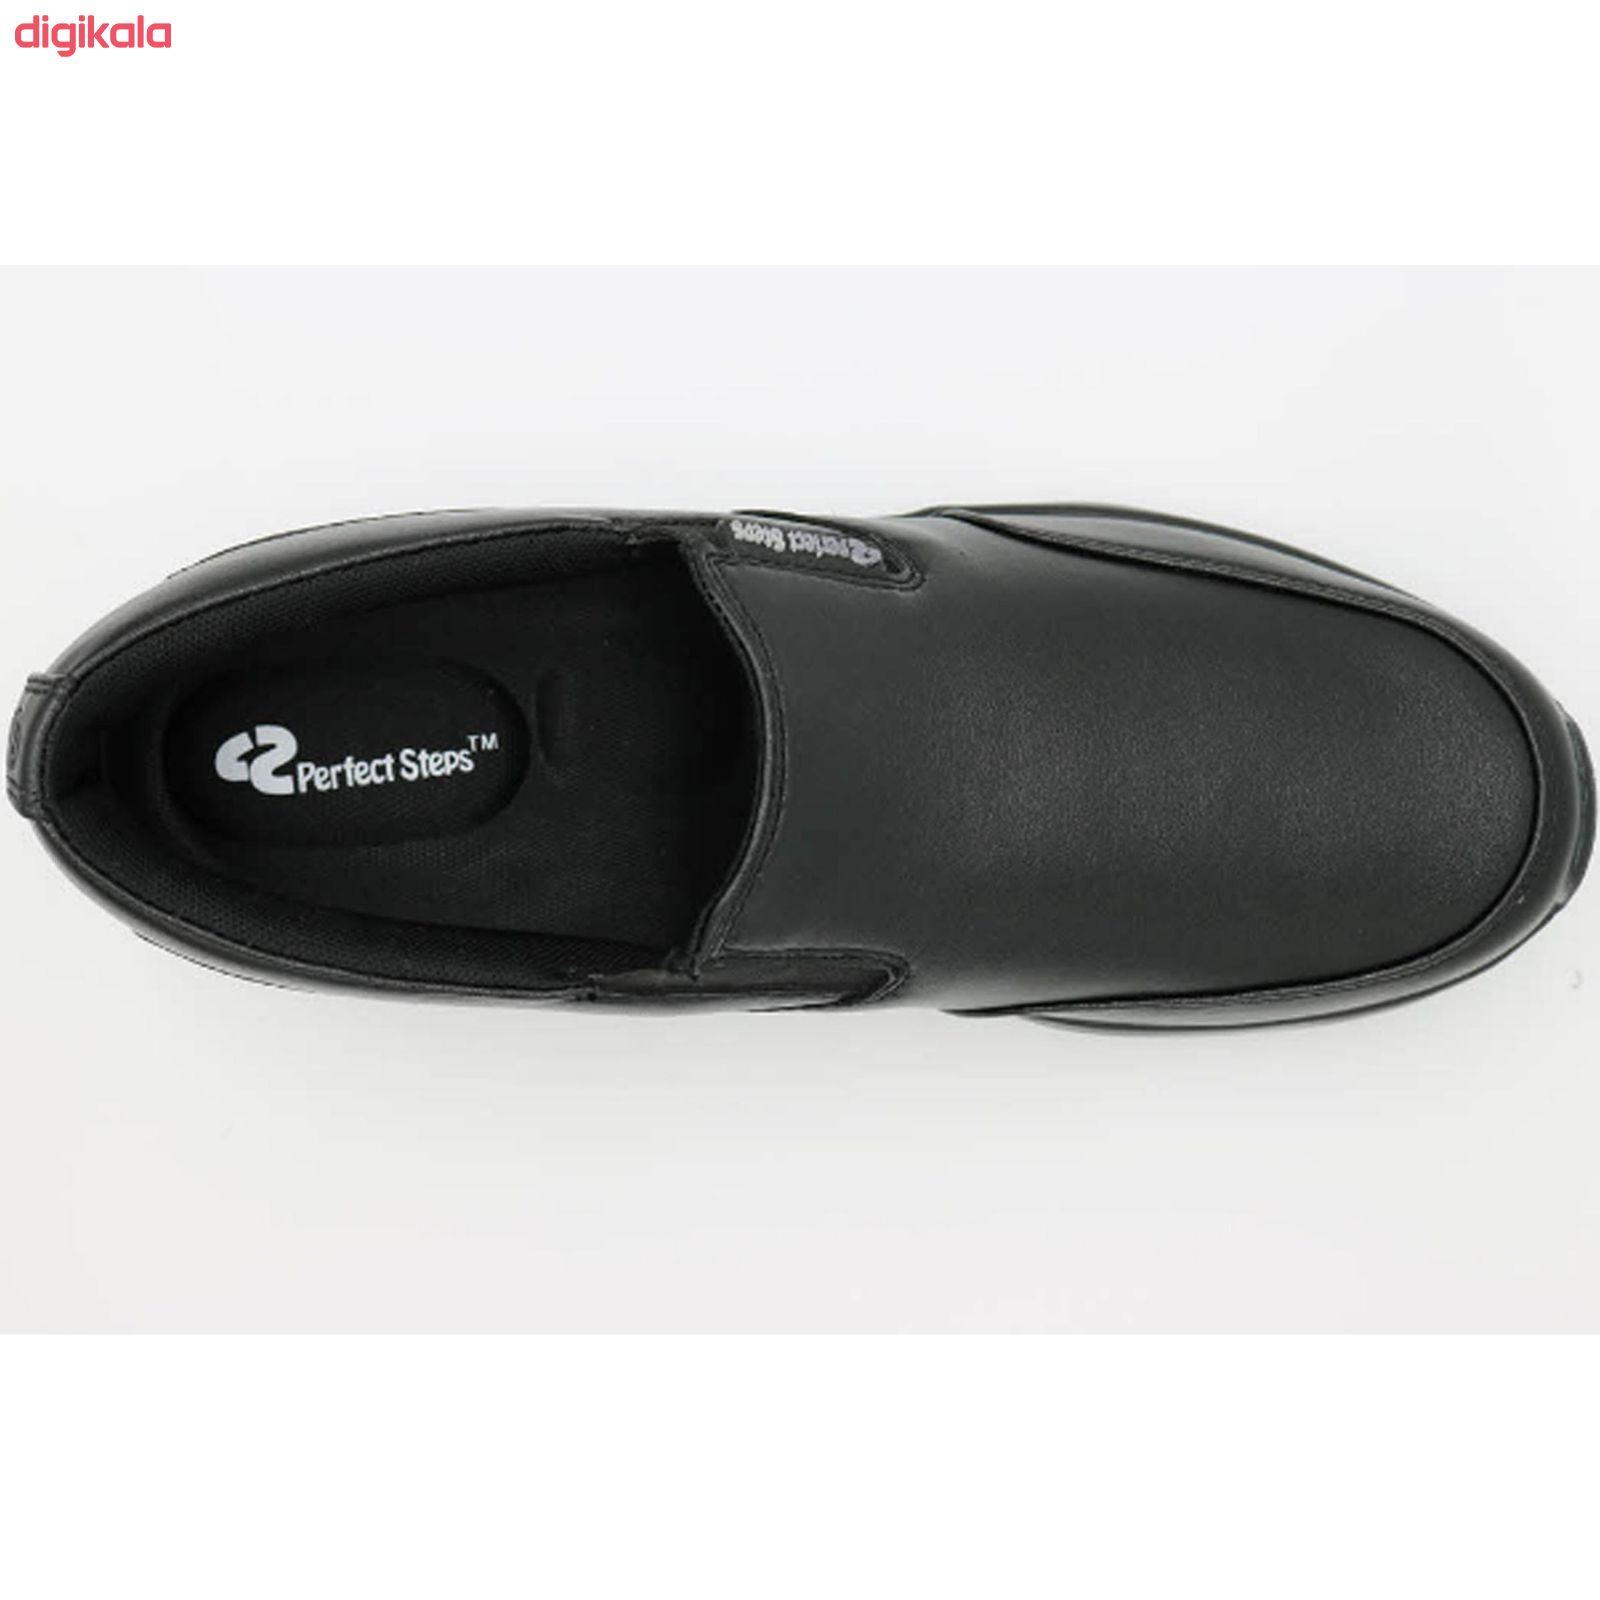 کفش مخصوص پیاده روی زنانه پرفکت استپس مدل پریمو کژوال رنگ مشکی main 1 4